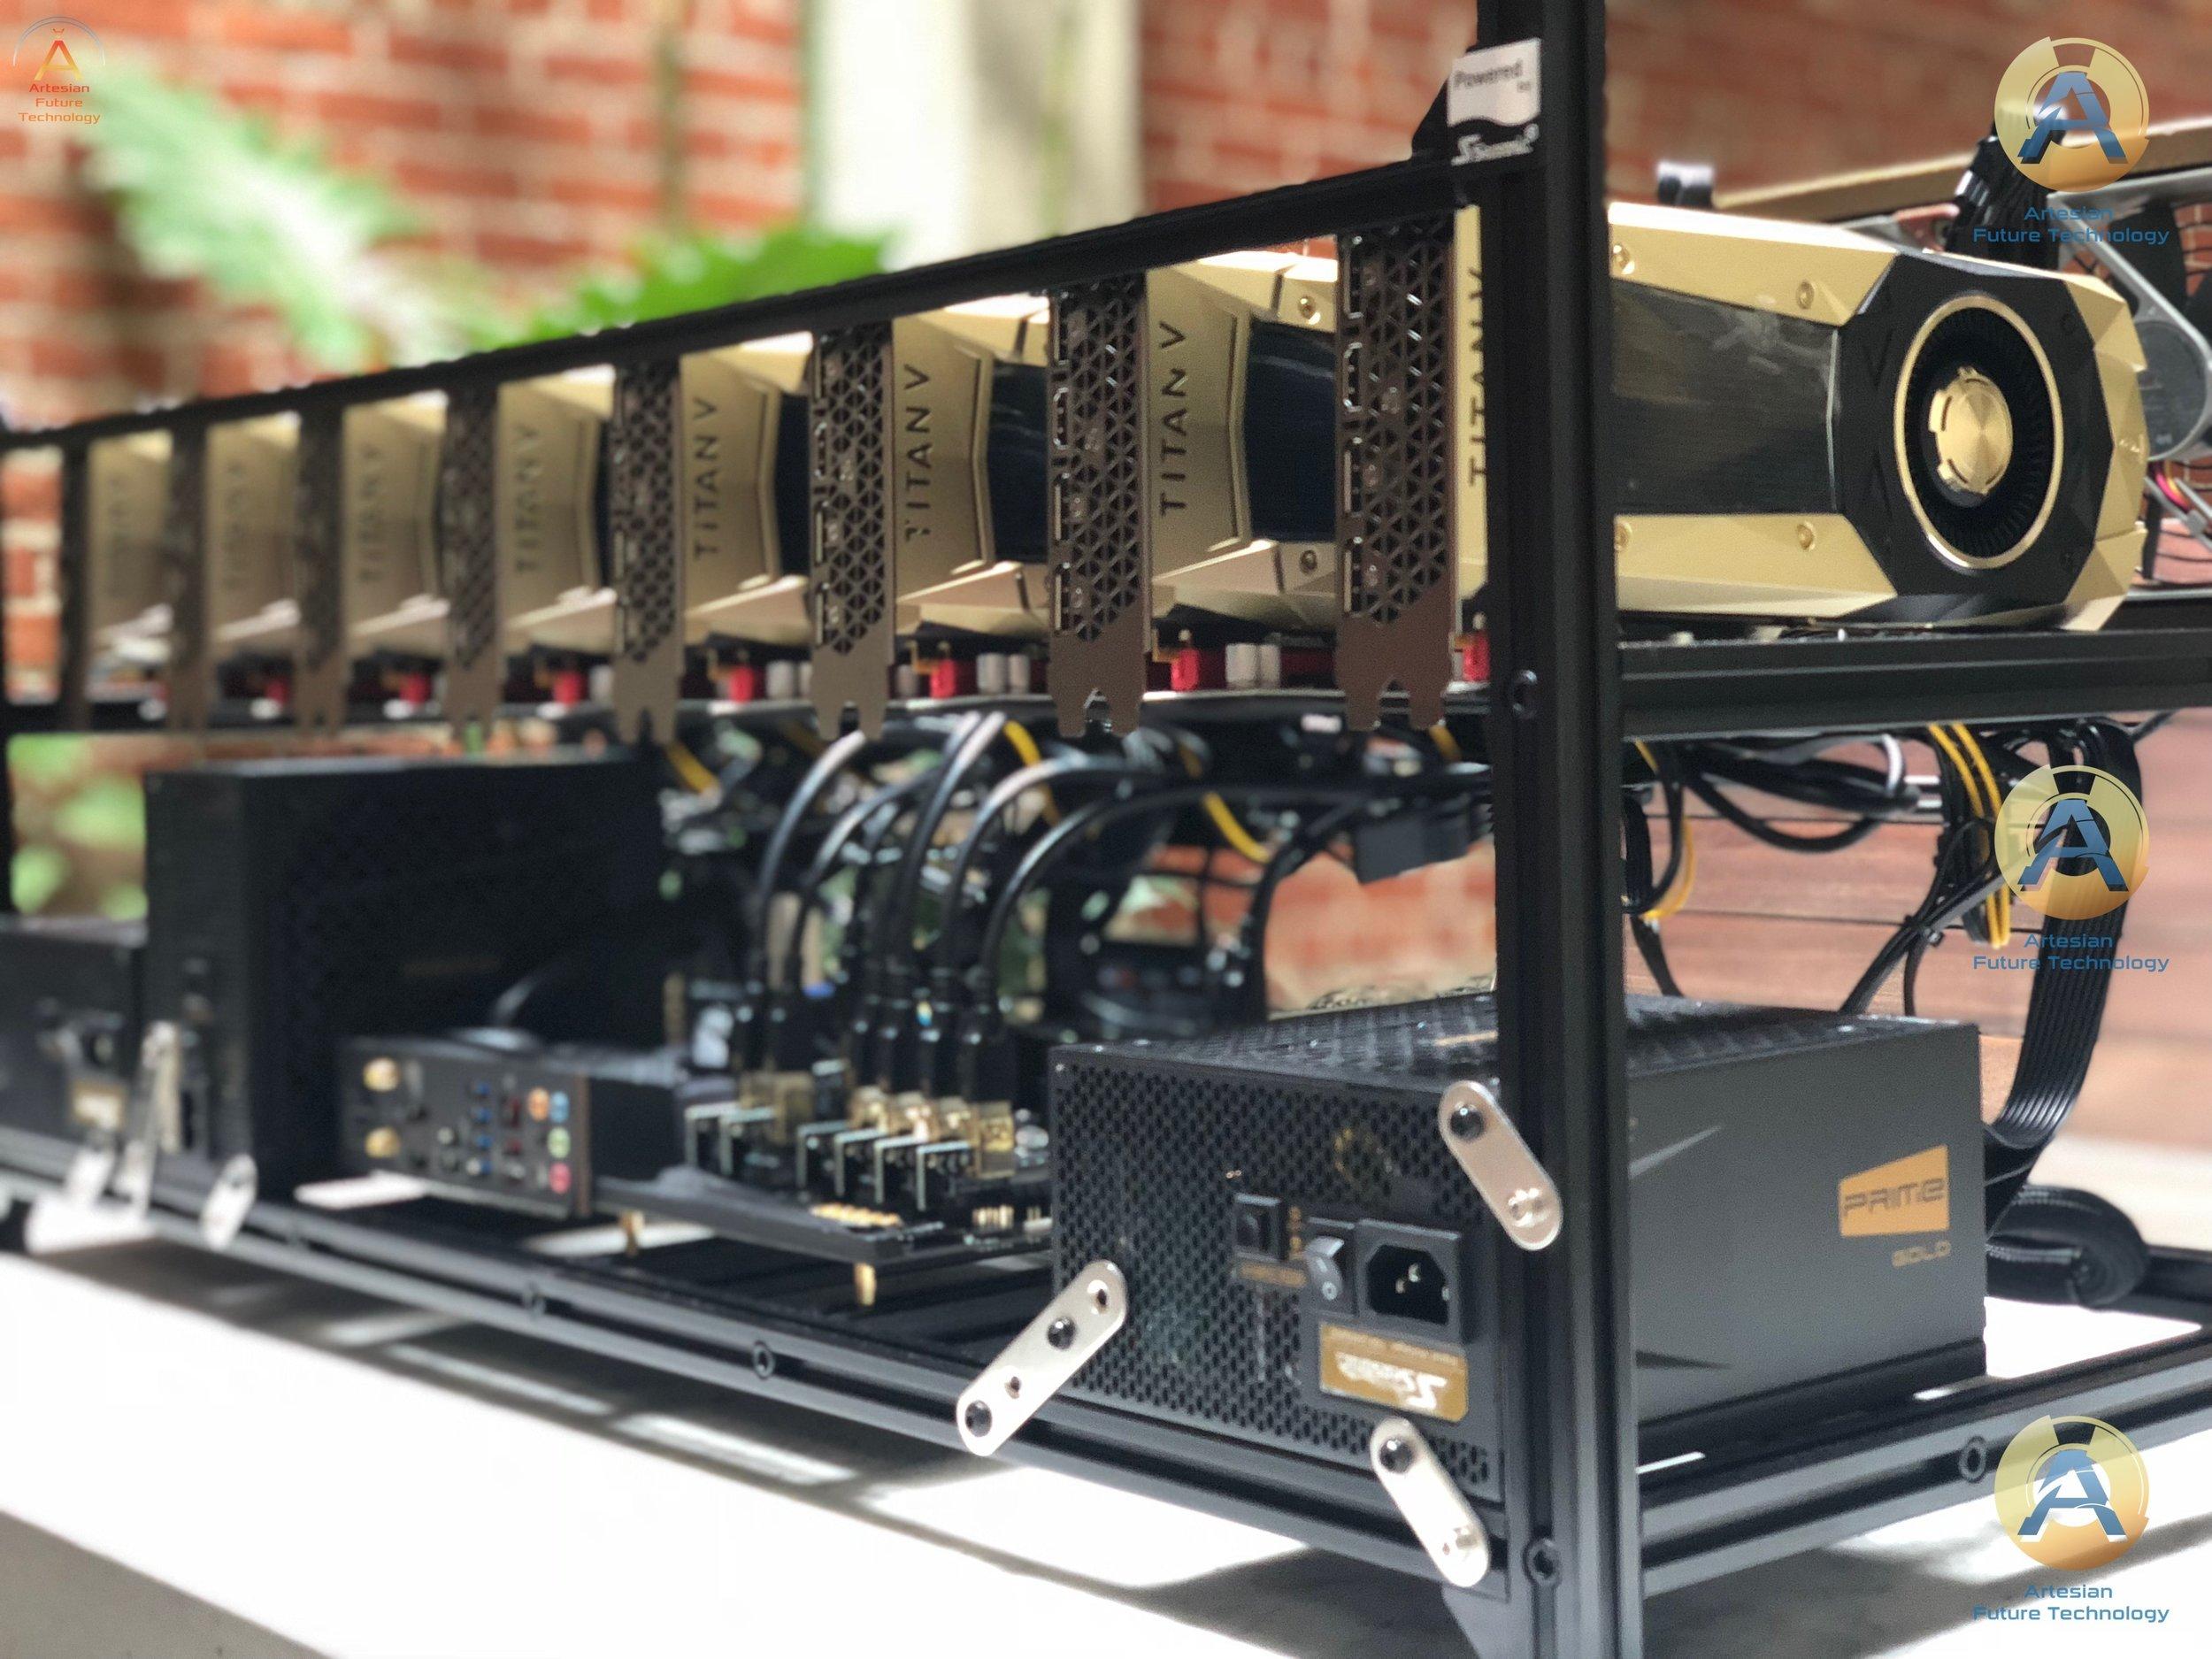 TITAN V 8GPU MASTER RIG - world's most powerful GPU miner [TITAN RTX also  available] — Artesian Future Technology